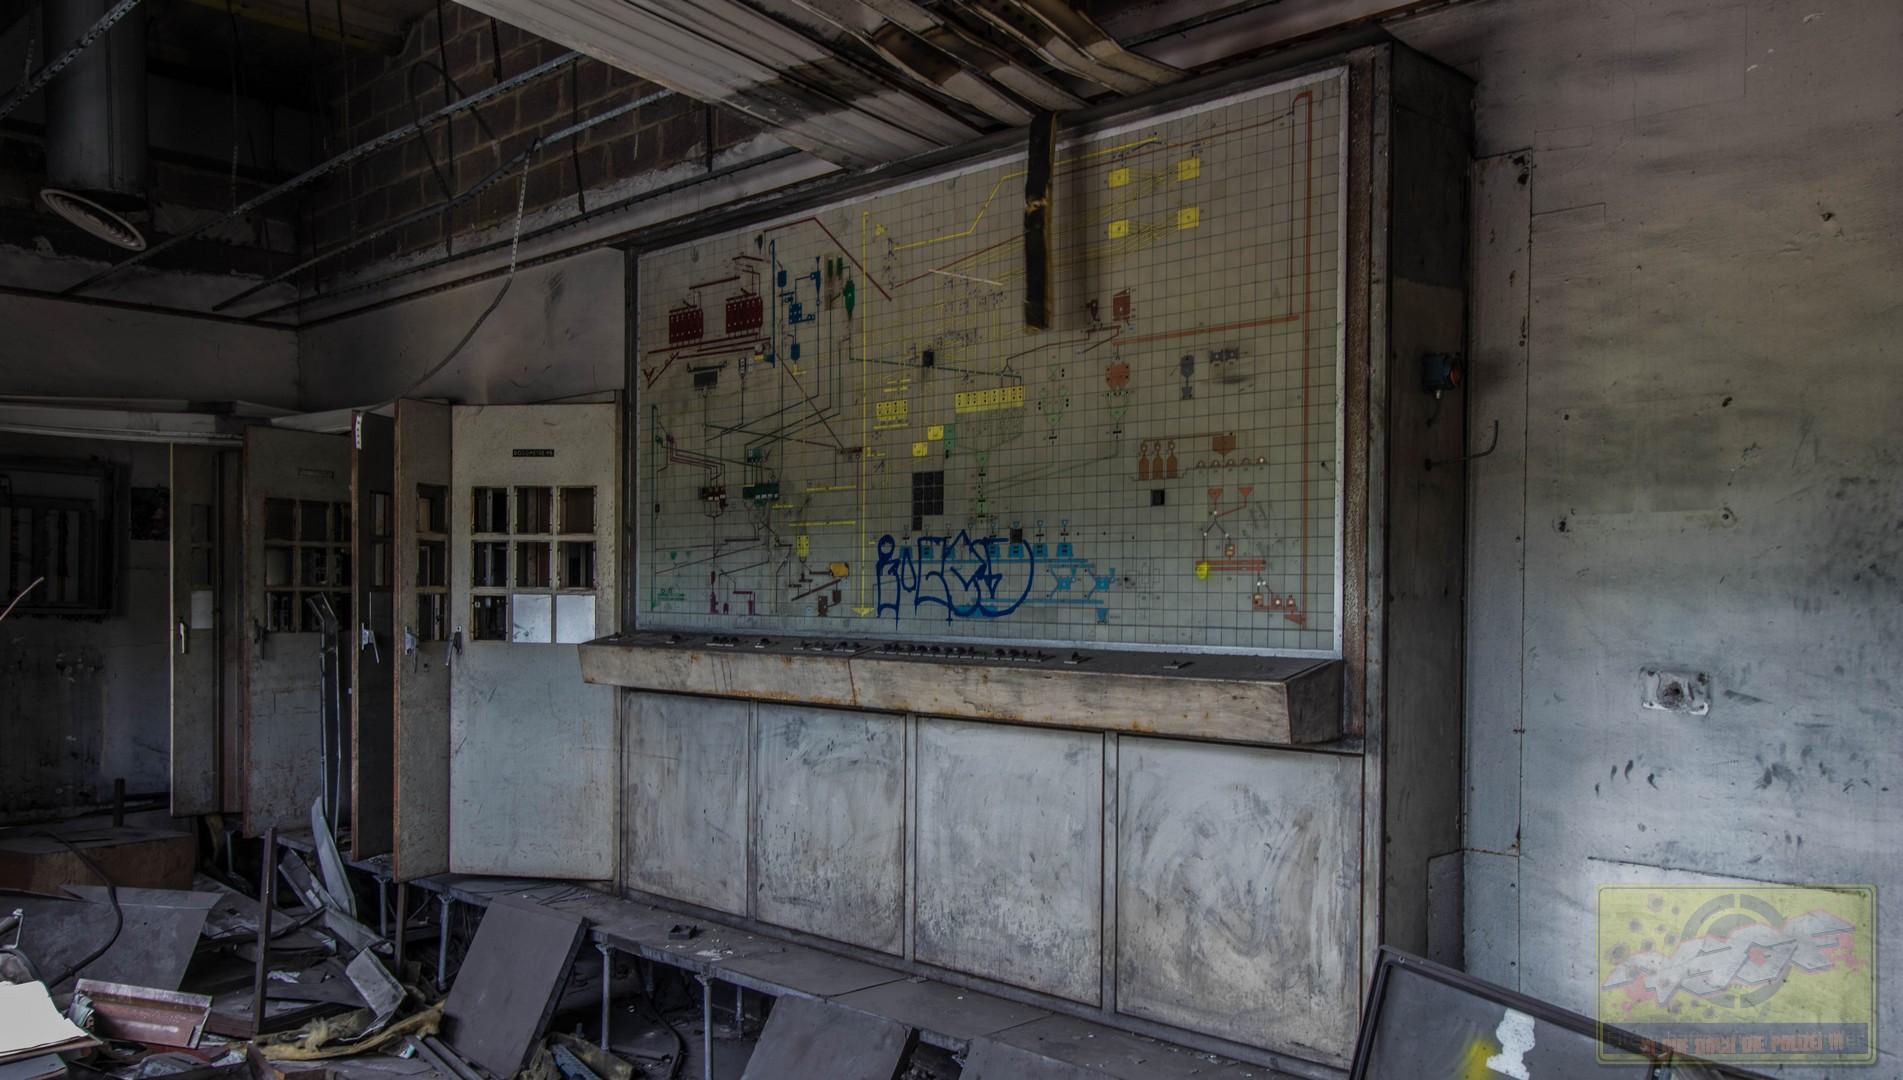 Bauxitfabrik-27.06.2020-15